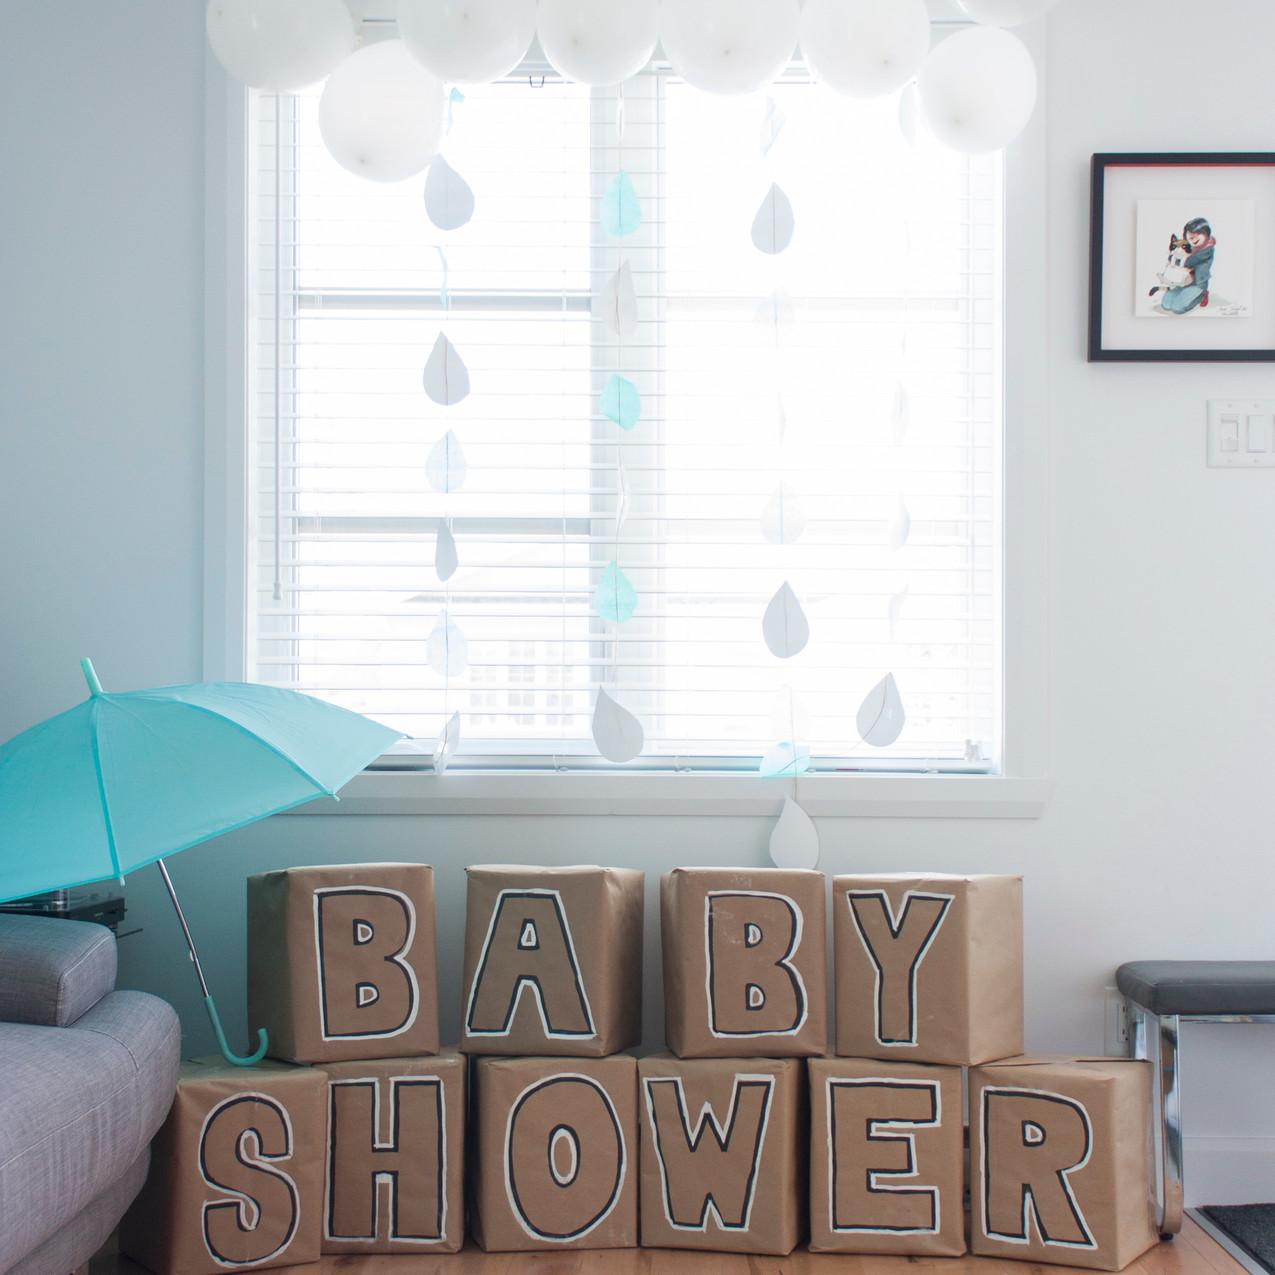 BabyShowerEstelleBachelard-1